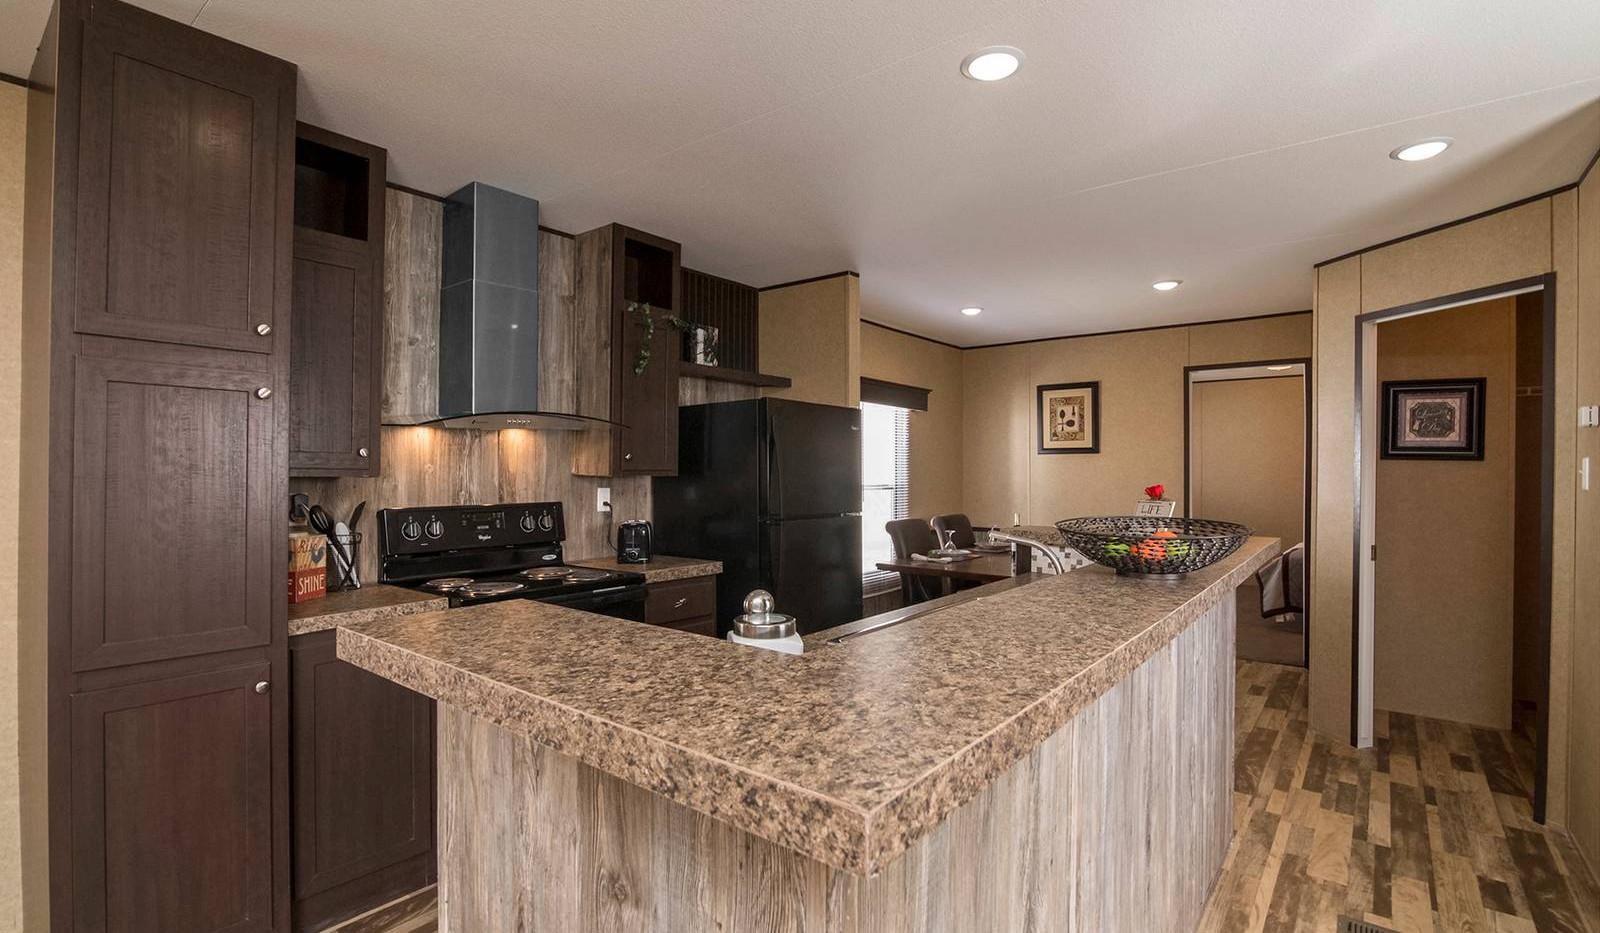 3-puebla-kitchen-1-corrected-1600x1067.j